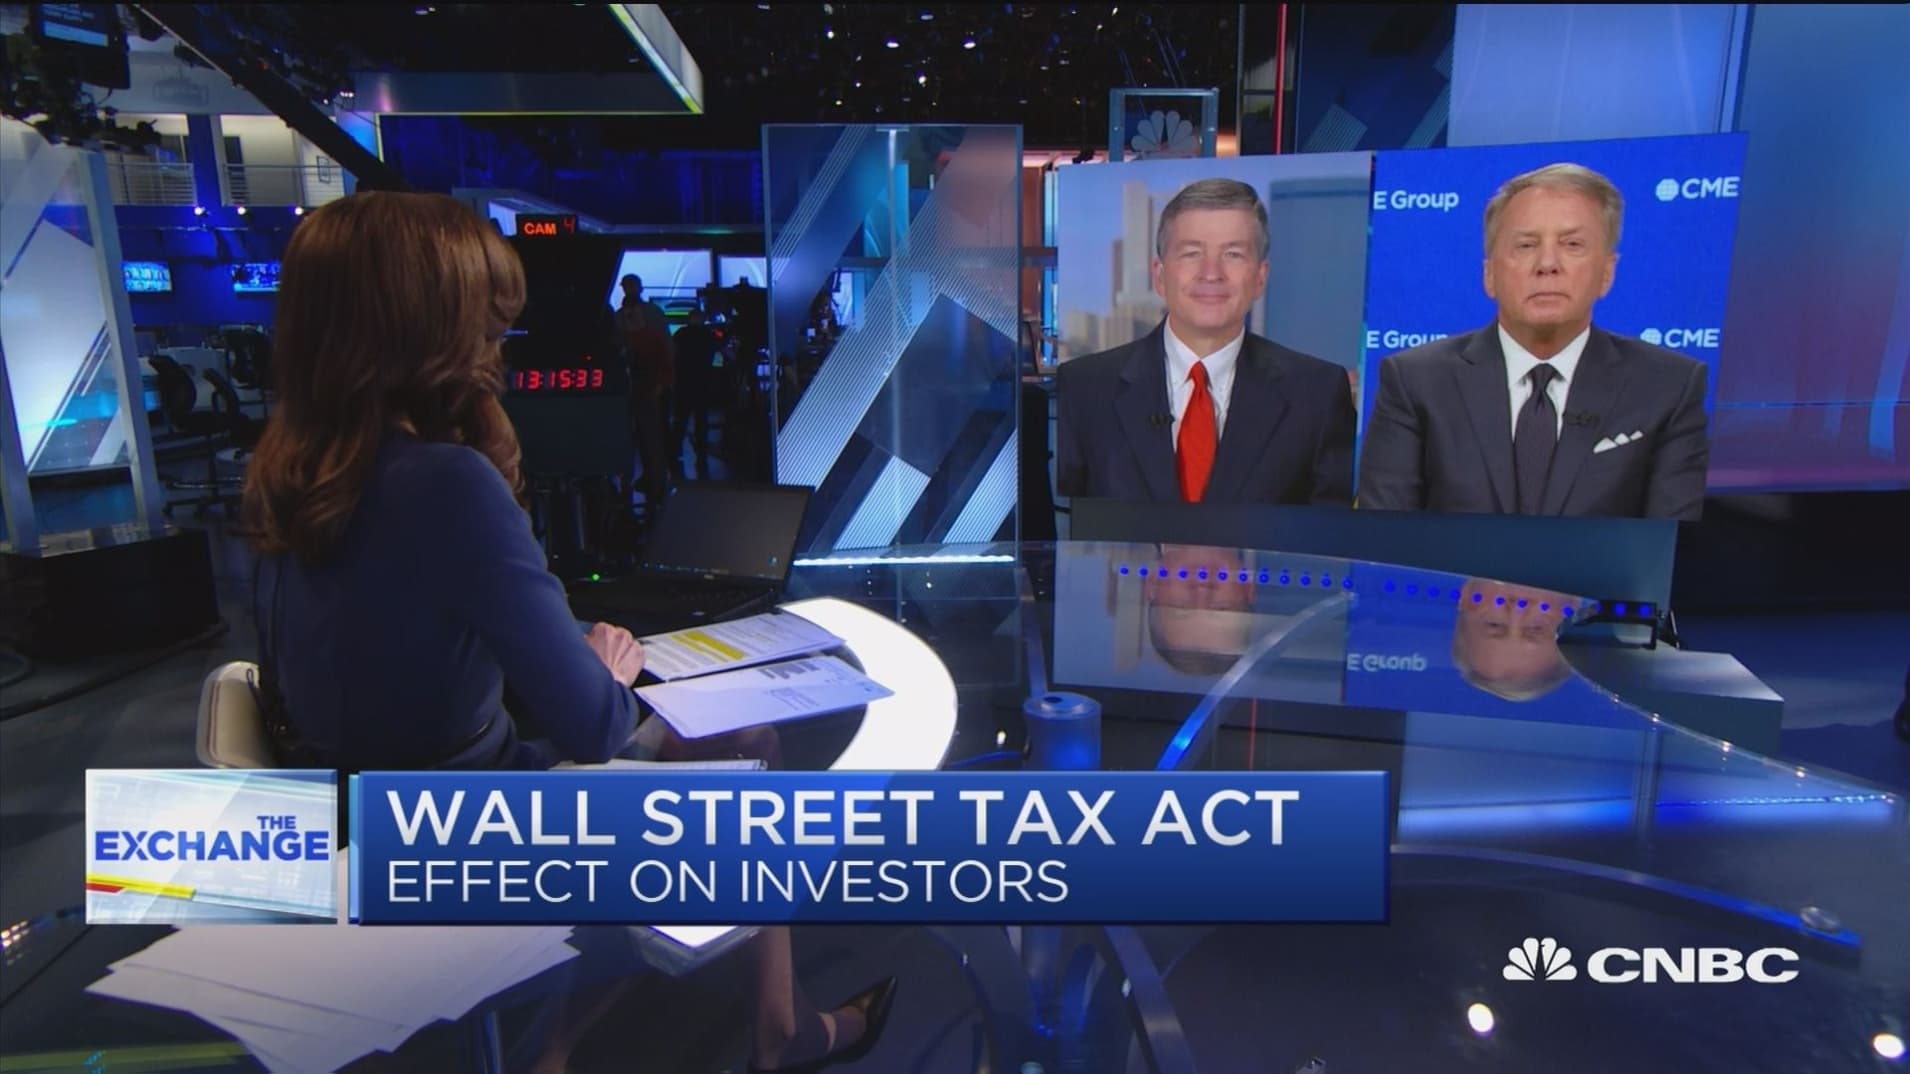 Wall Street Tax Act will go on to hurt Main Street, says Jeb Hensarling